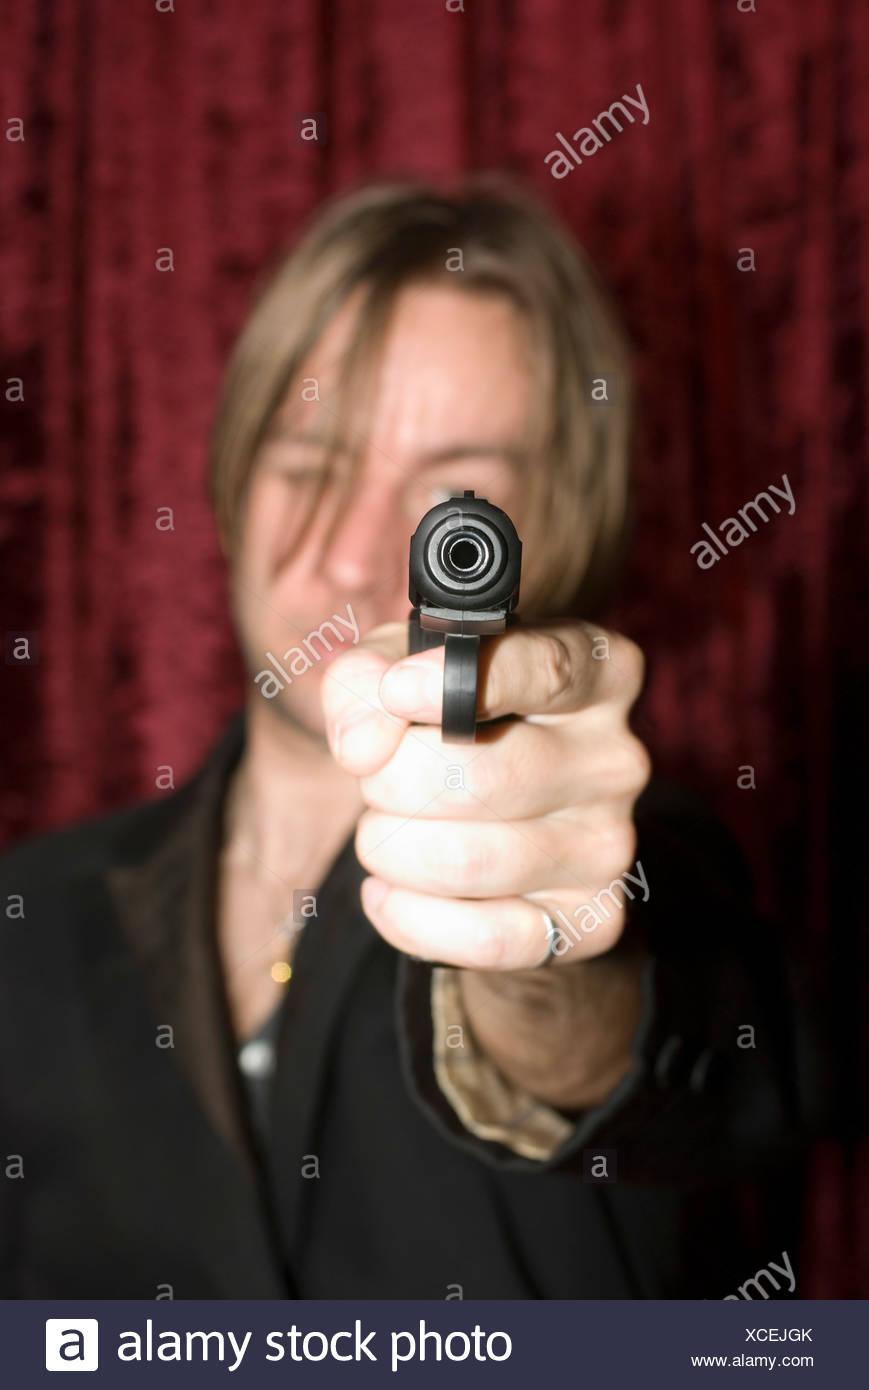 A man aiming a gun - Stock Image